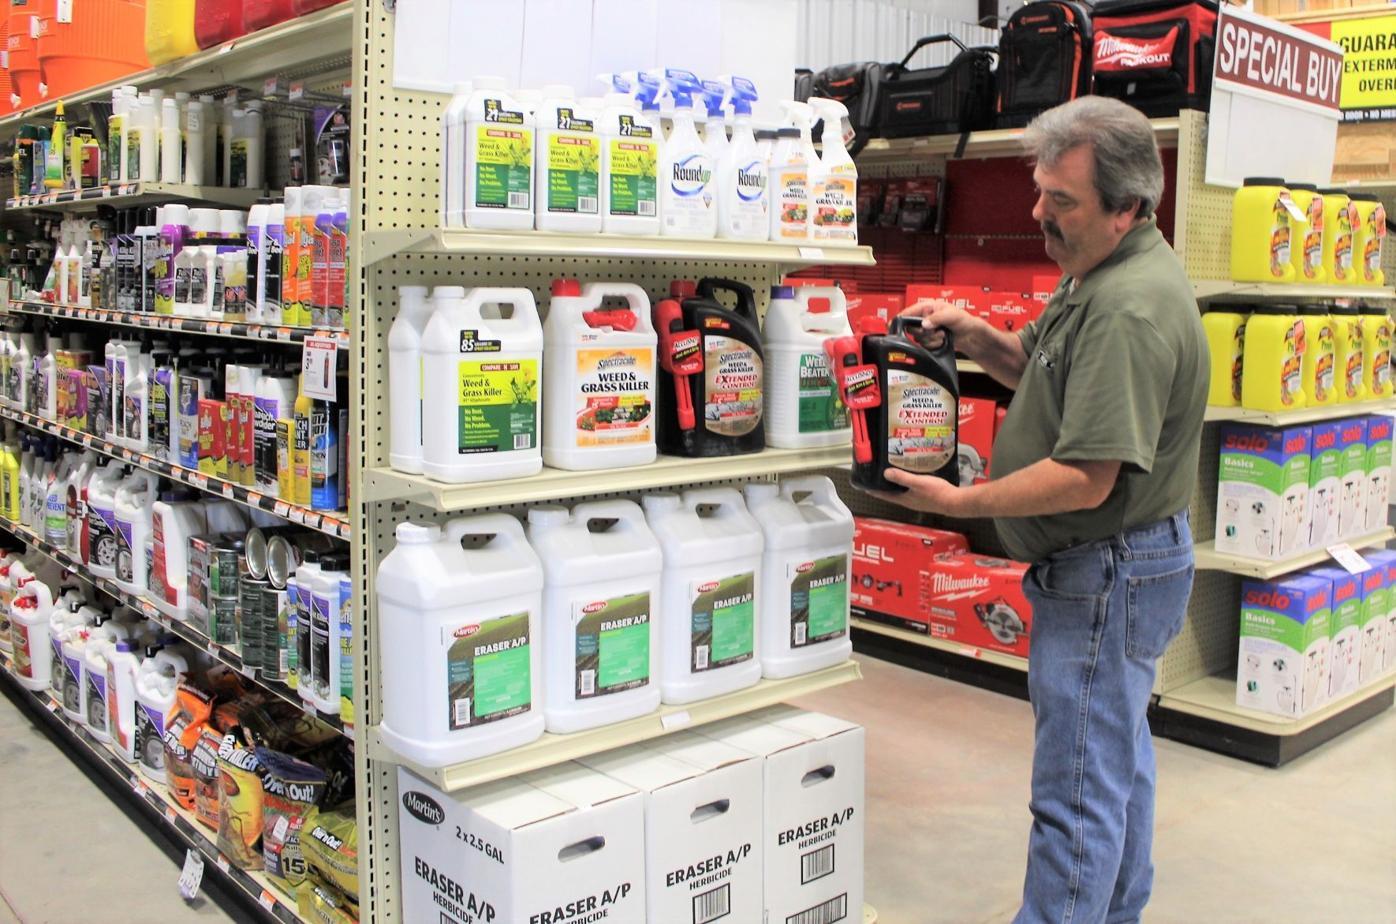 mcj-2021-05-05-news-business-nettleton-hardware-herbicides